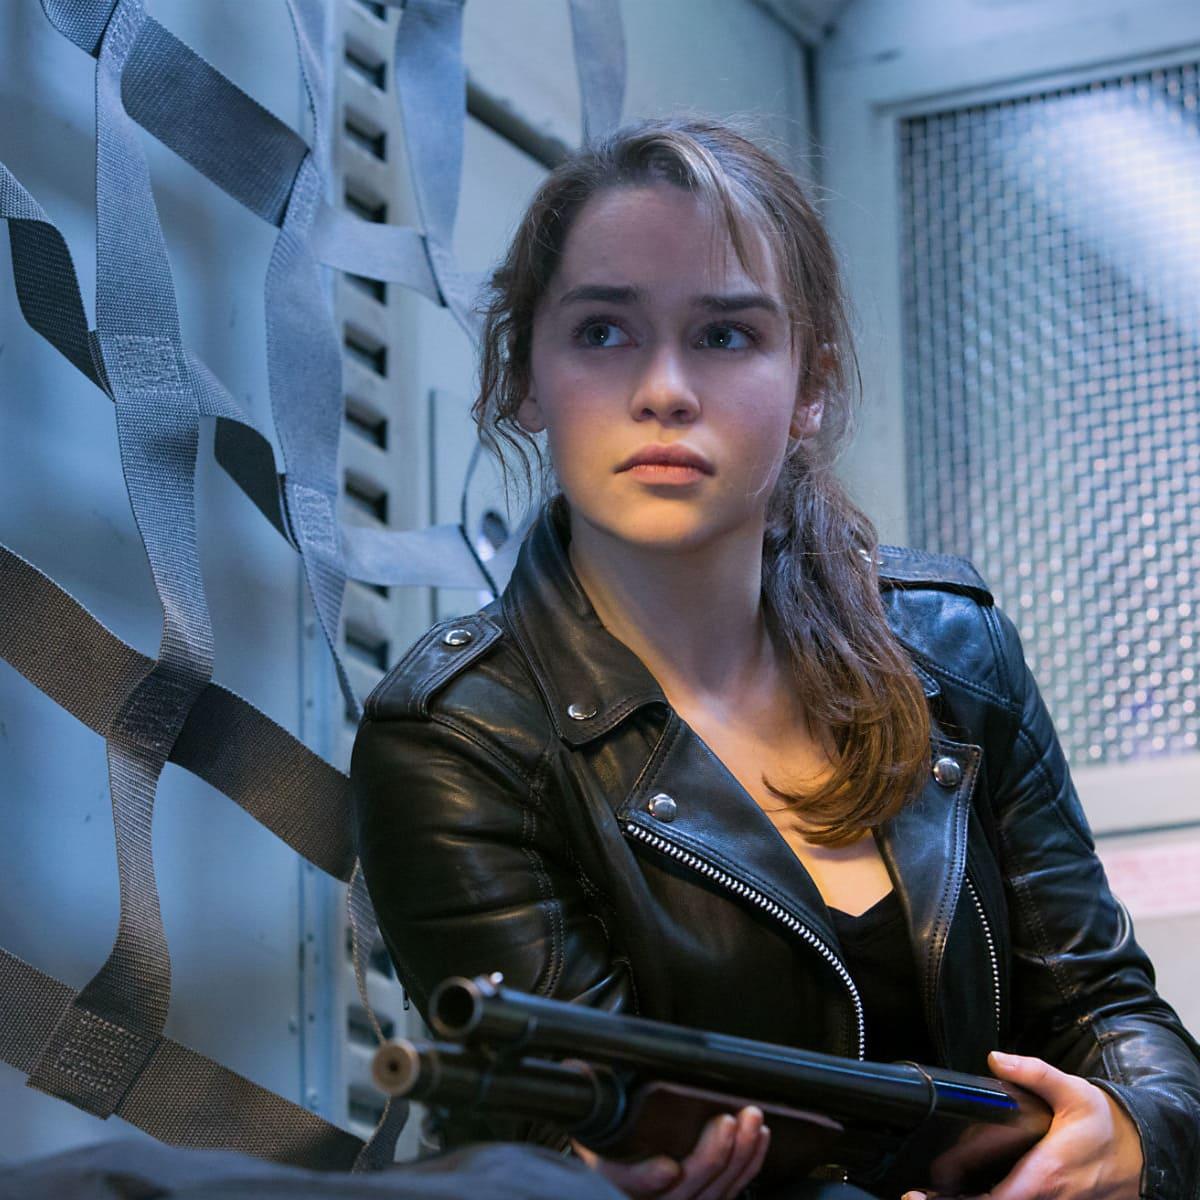 Emilia Clarke in Terminator Genisys